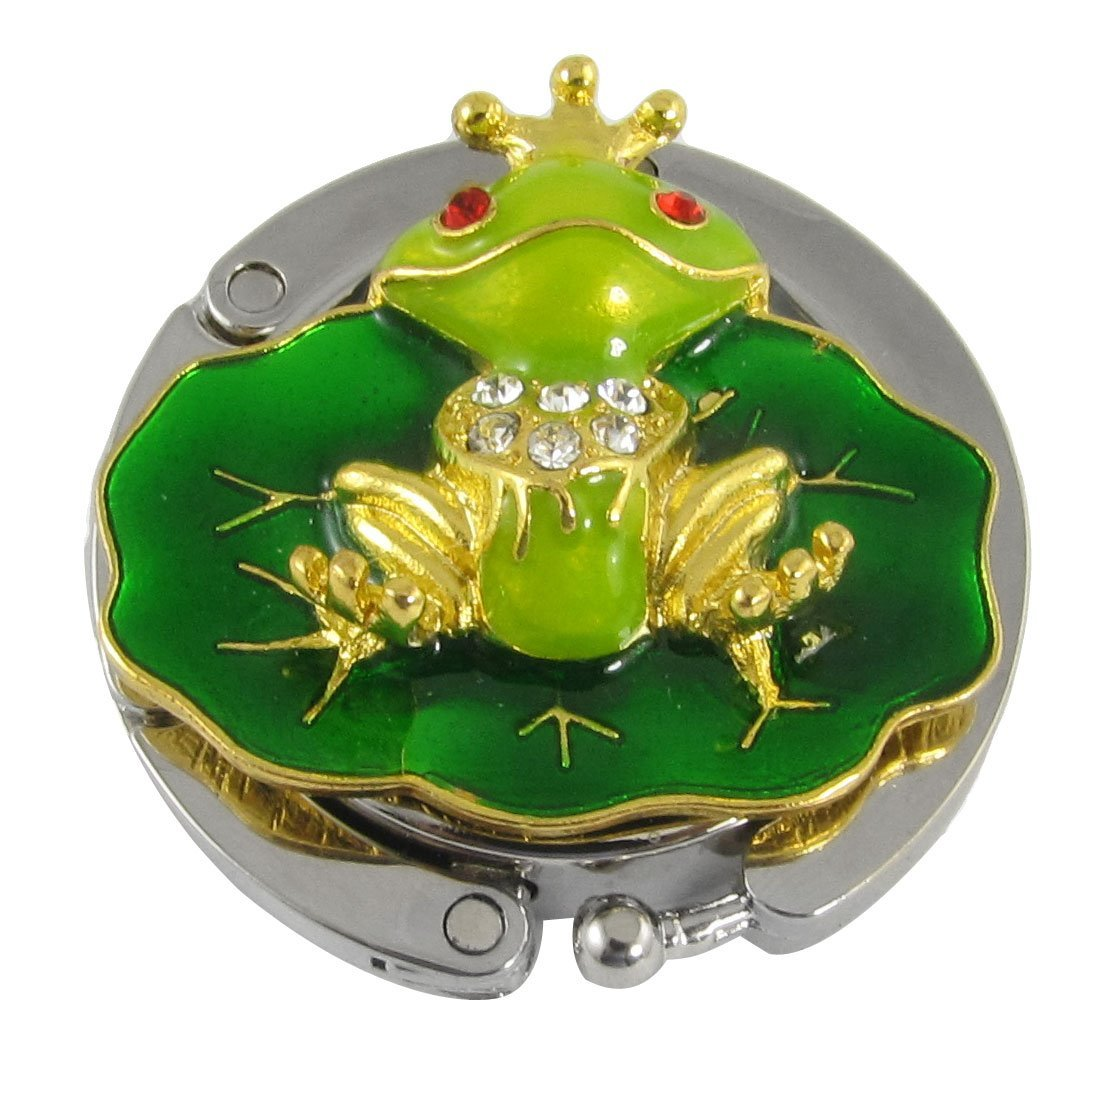 Cute Gold Tone Green Frog Purse Bag Handbag Hanger Hook Holder